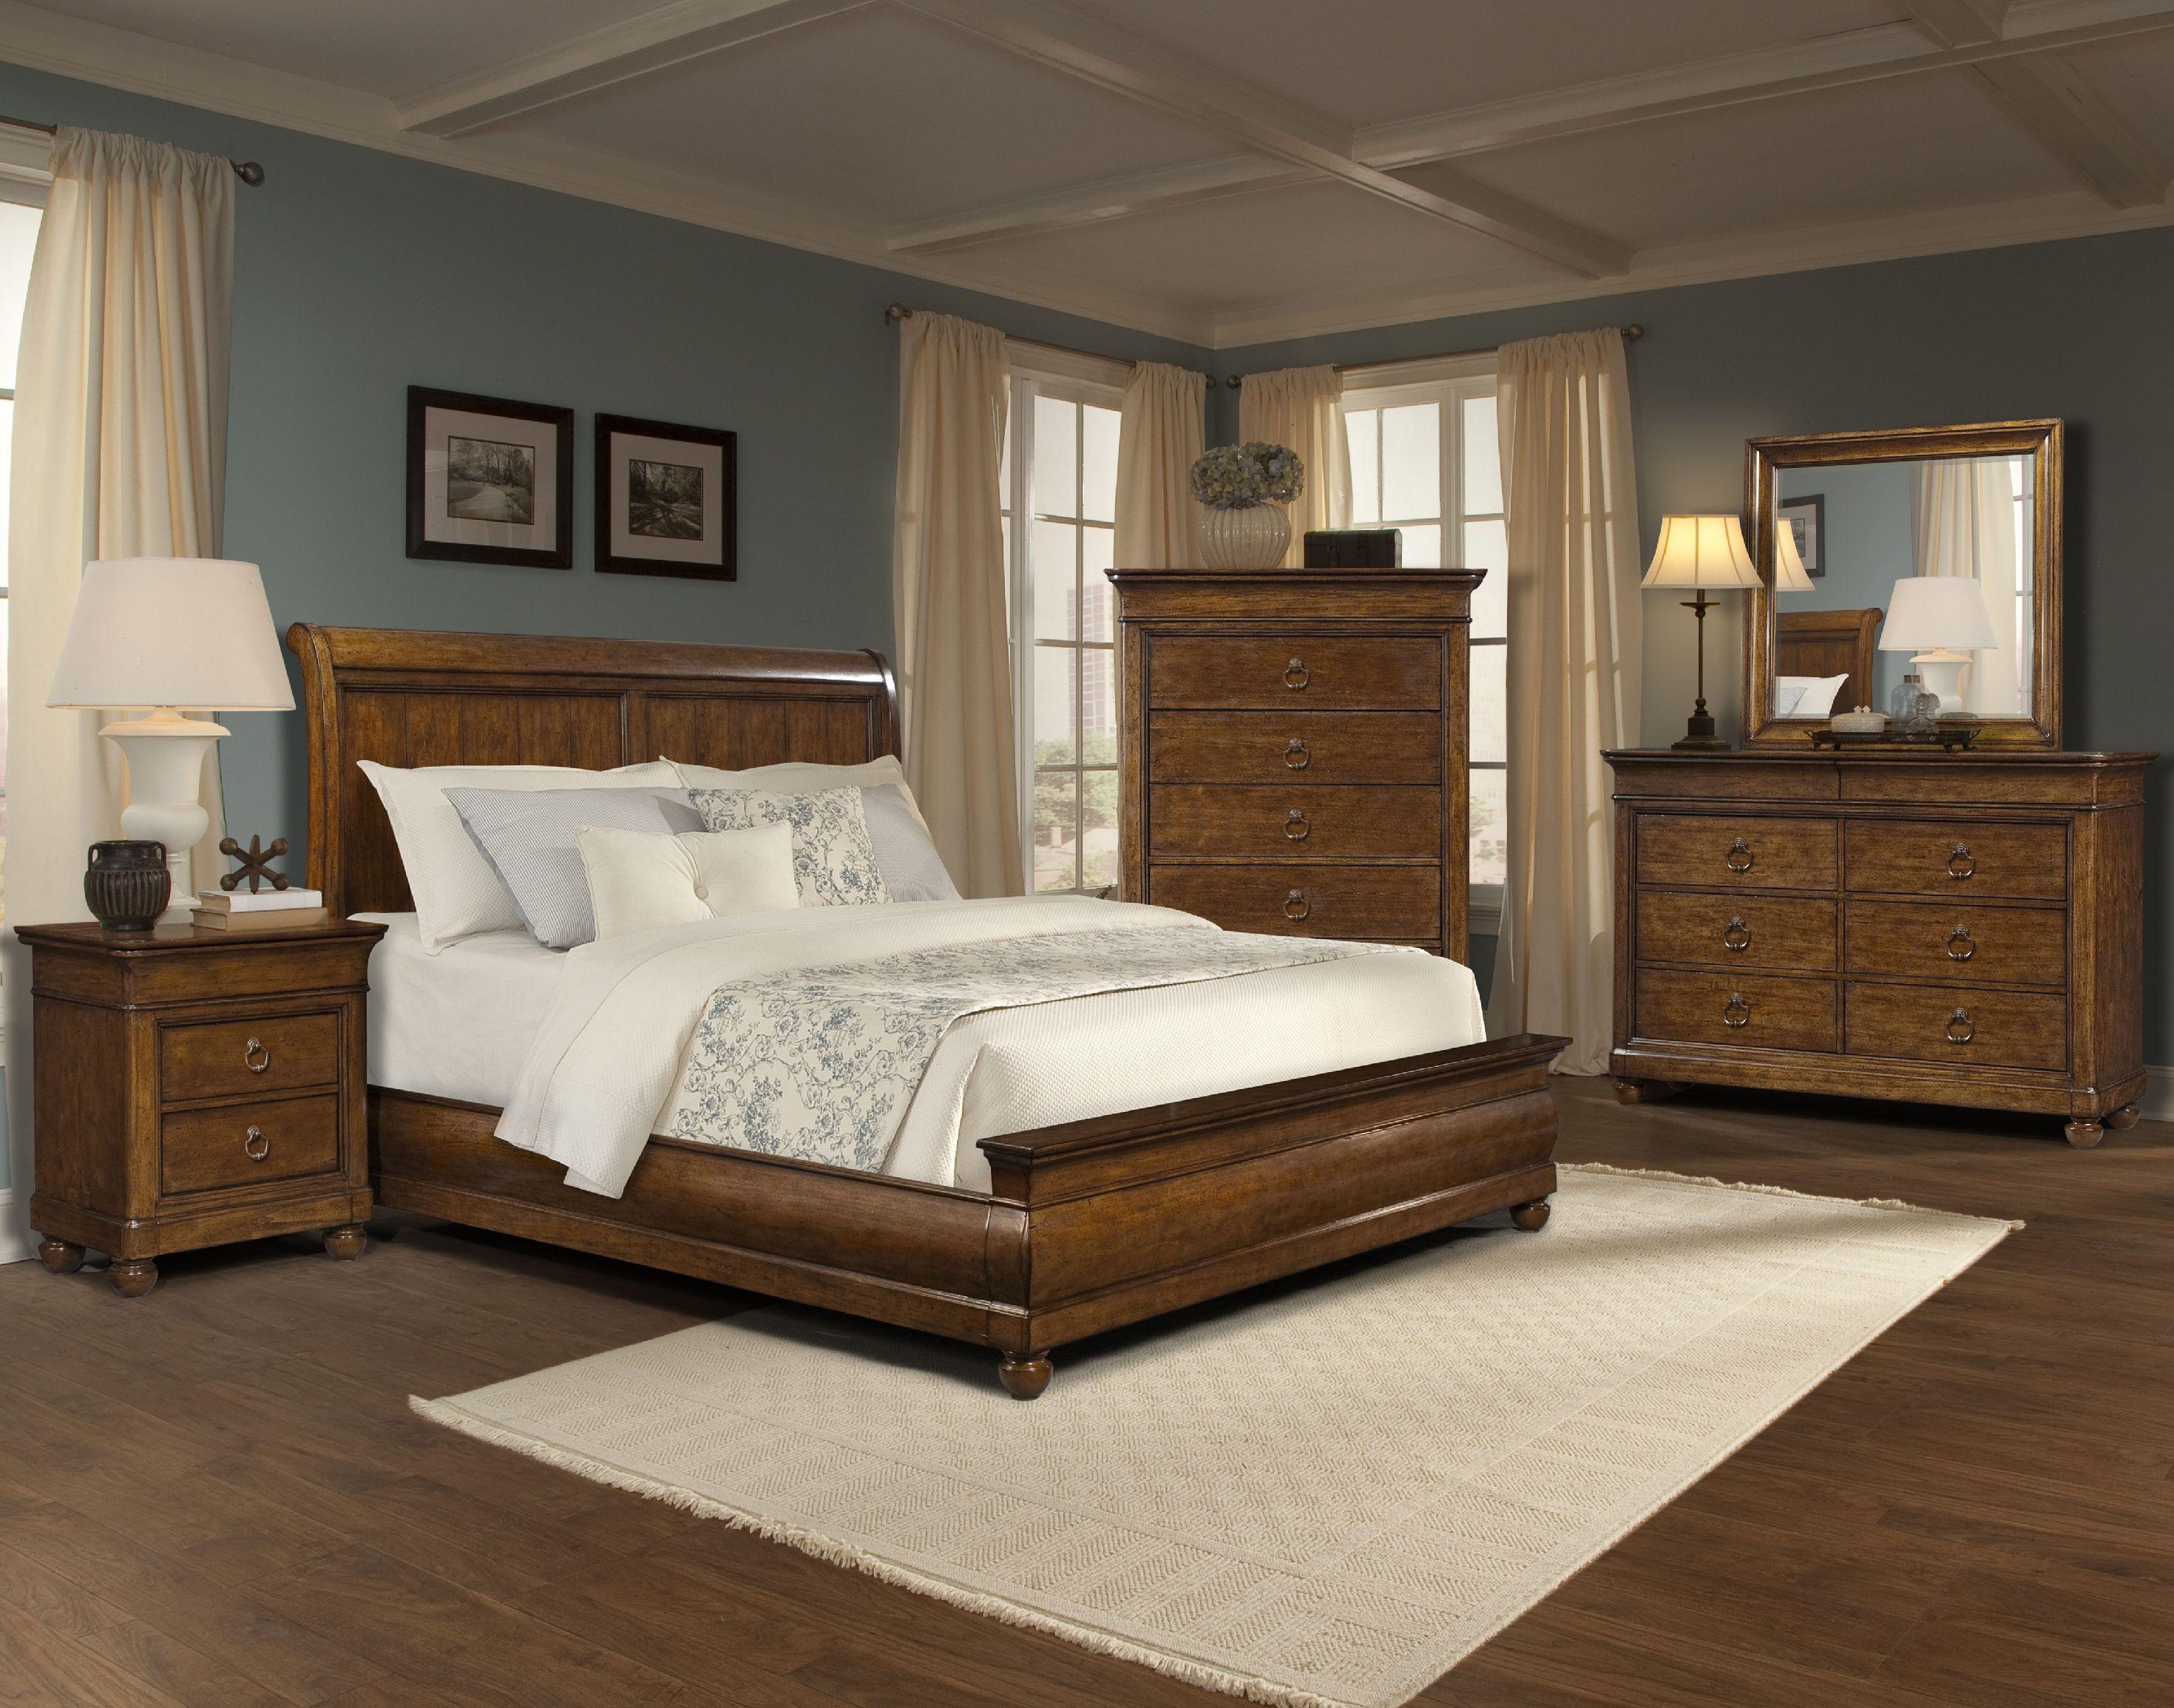 17 best images about klaussner bedroom furniture on pinterest